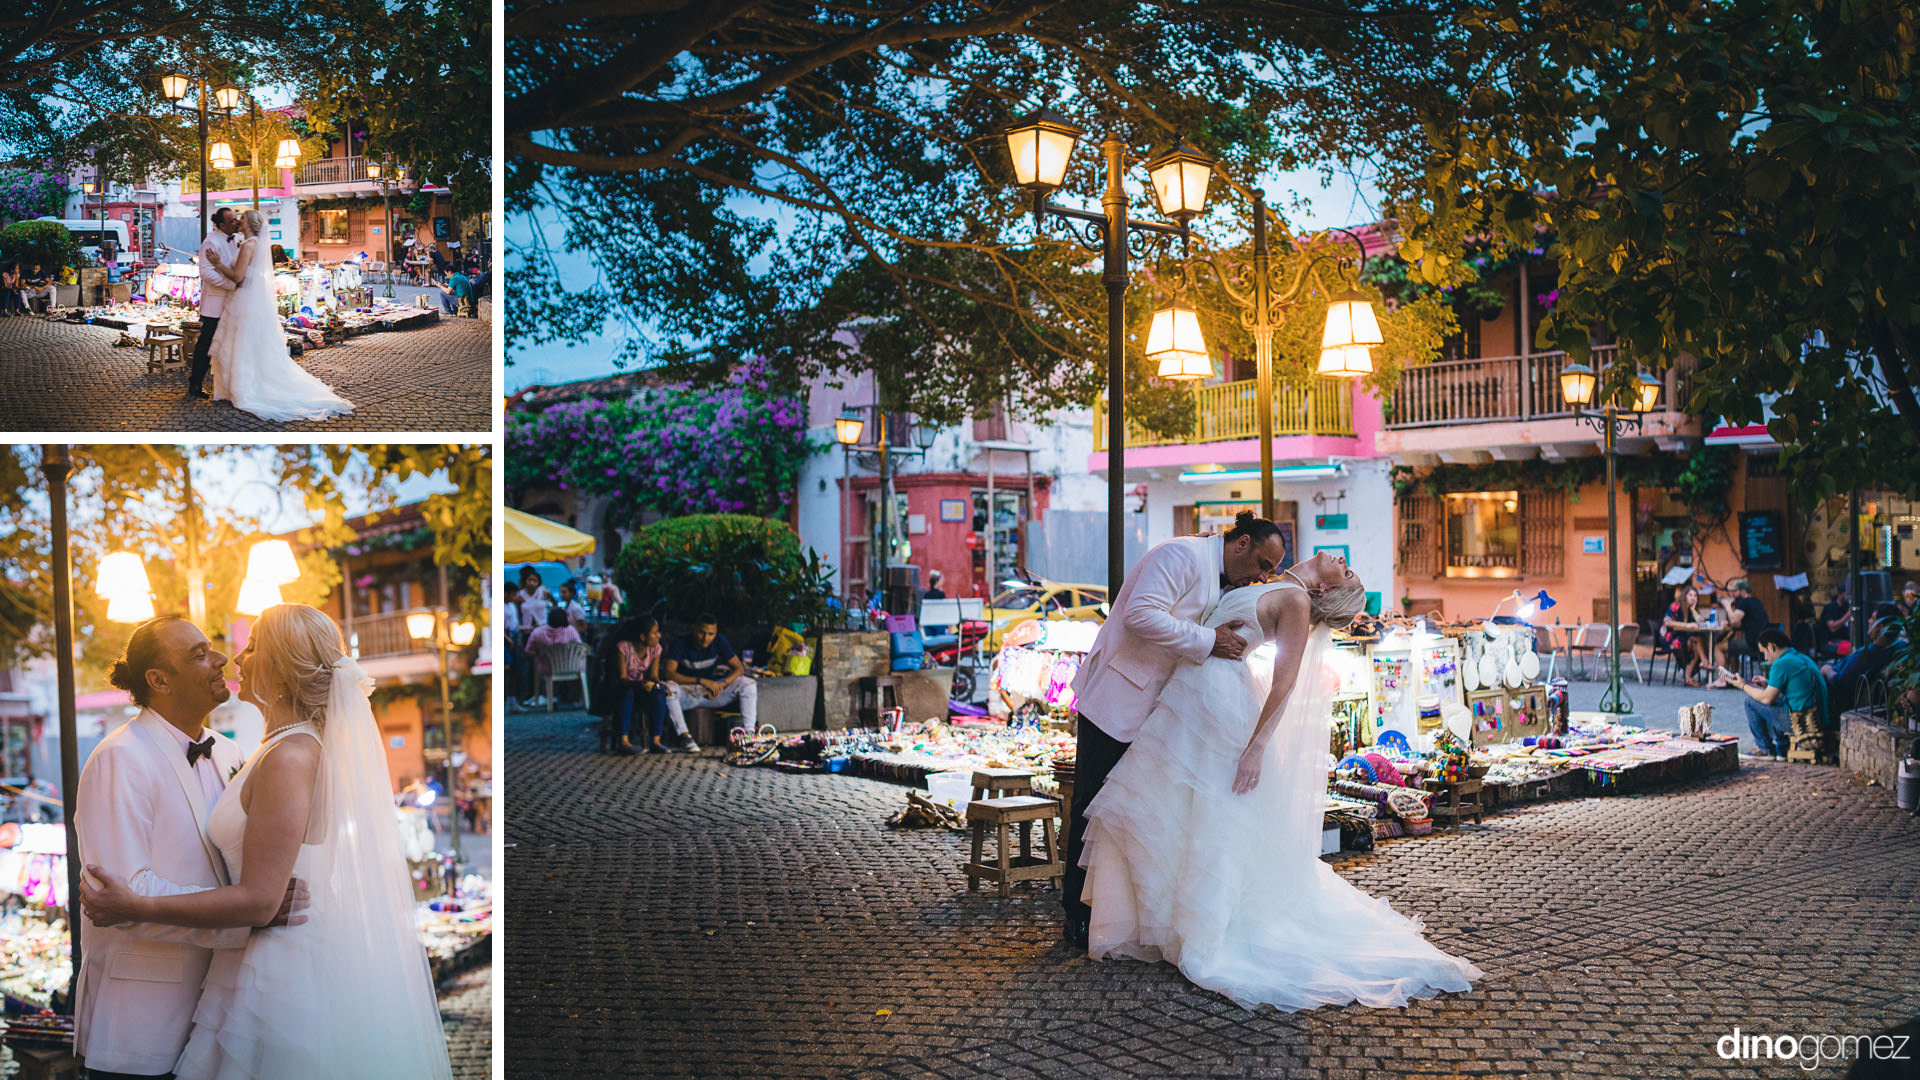 Professional Wedding Photographer In Casa La Cartujita Cartagena - St